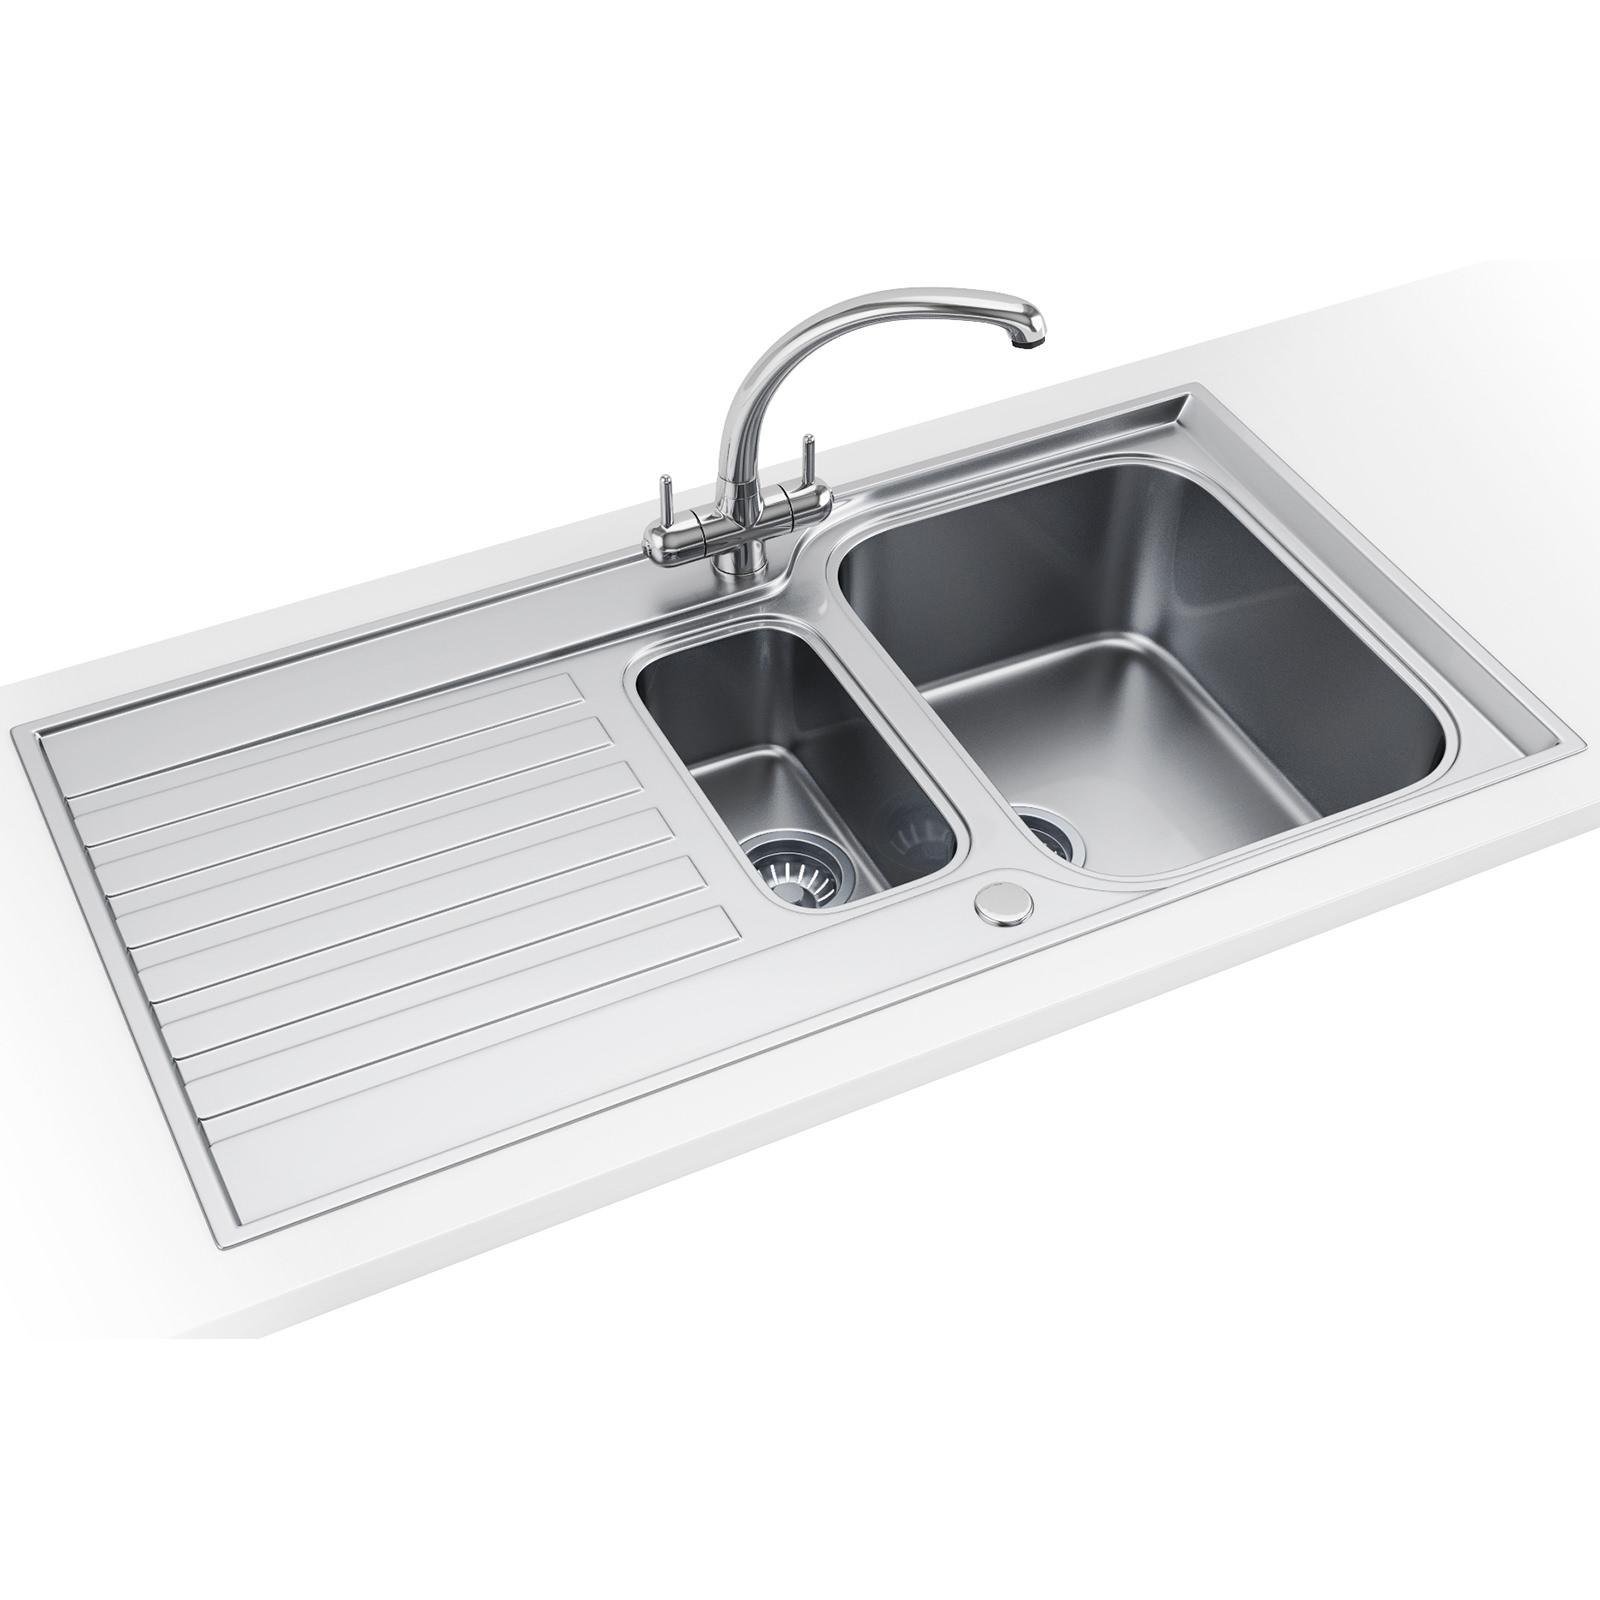 franke ascona asx 651 stainless steel 1 5 bowl inset sink